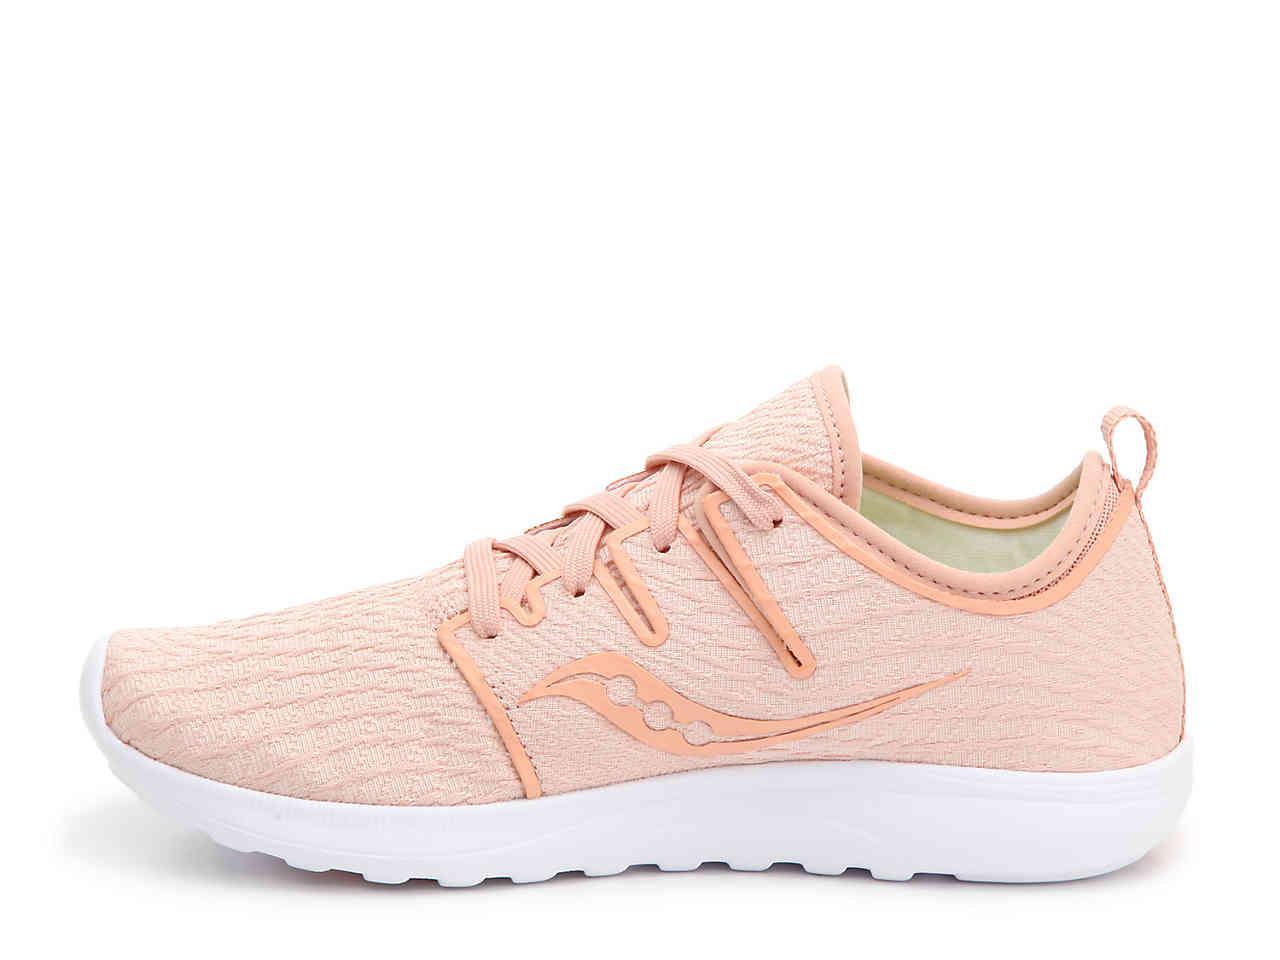 saucony lightweight running shoes